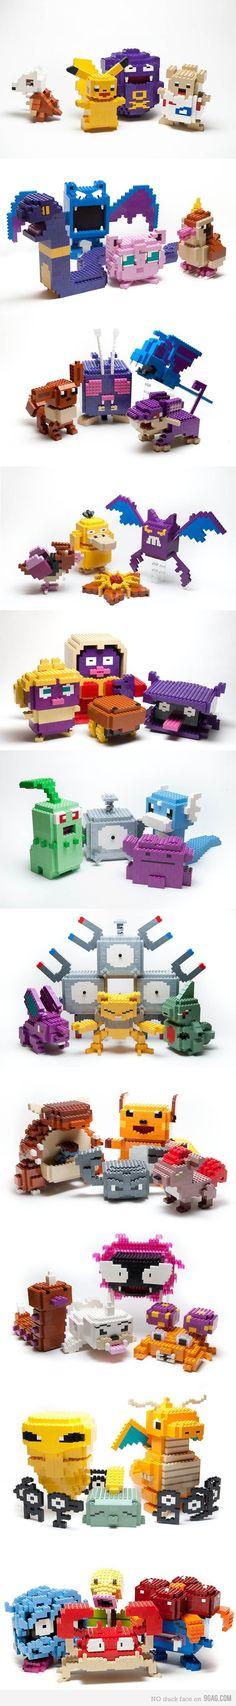 LEGO Pokemon #lego #legosculpture #legomodel #pokemon #legopokemon